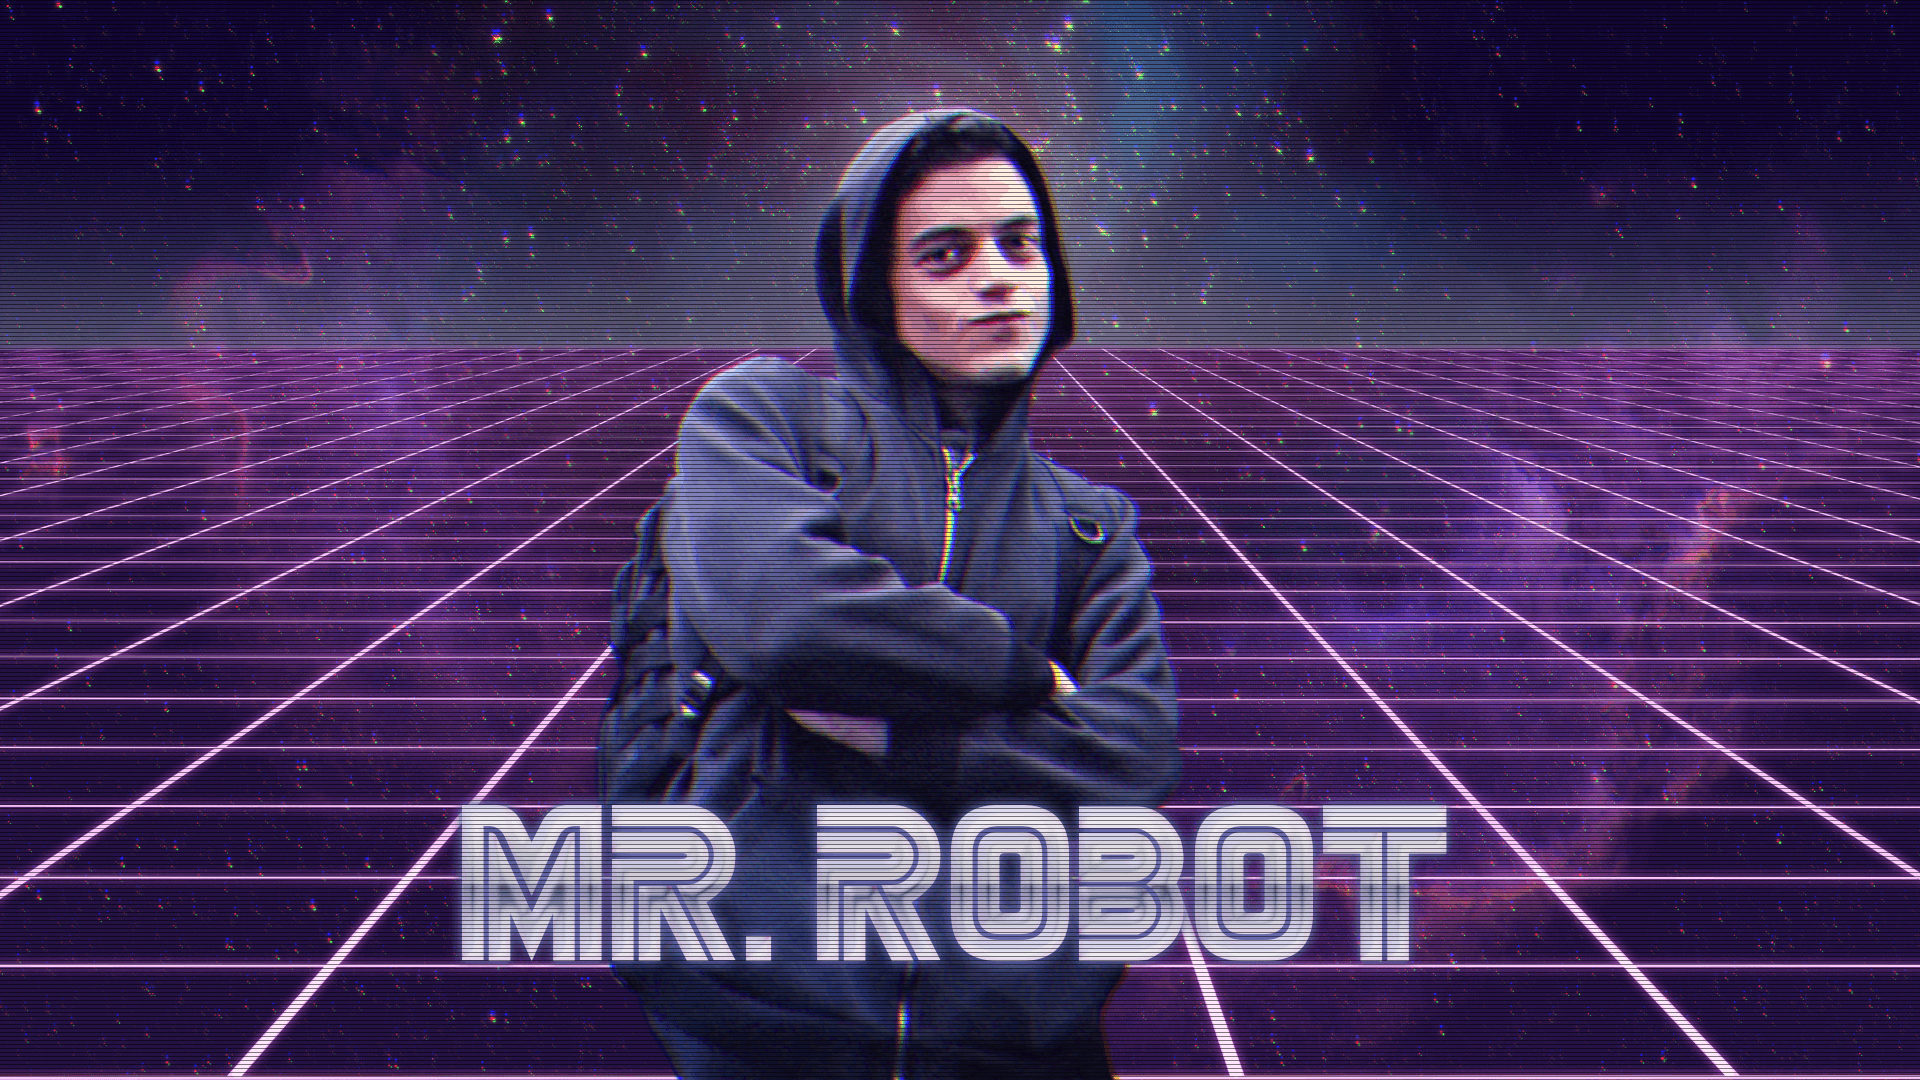 Mr. Robot Wallpapers - Wallpaper Cave